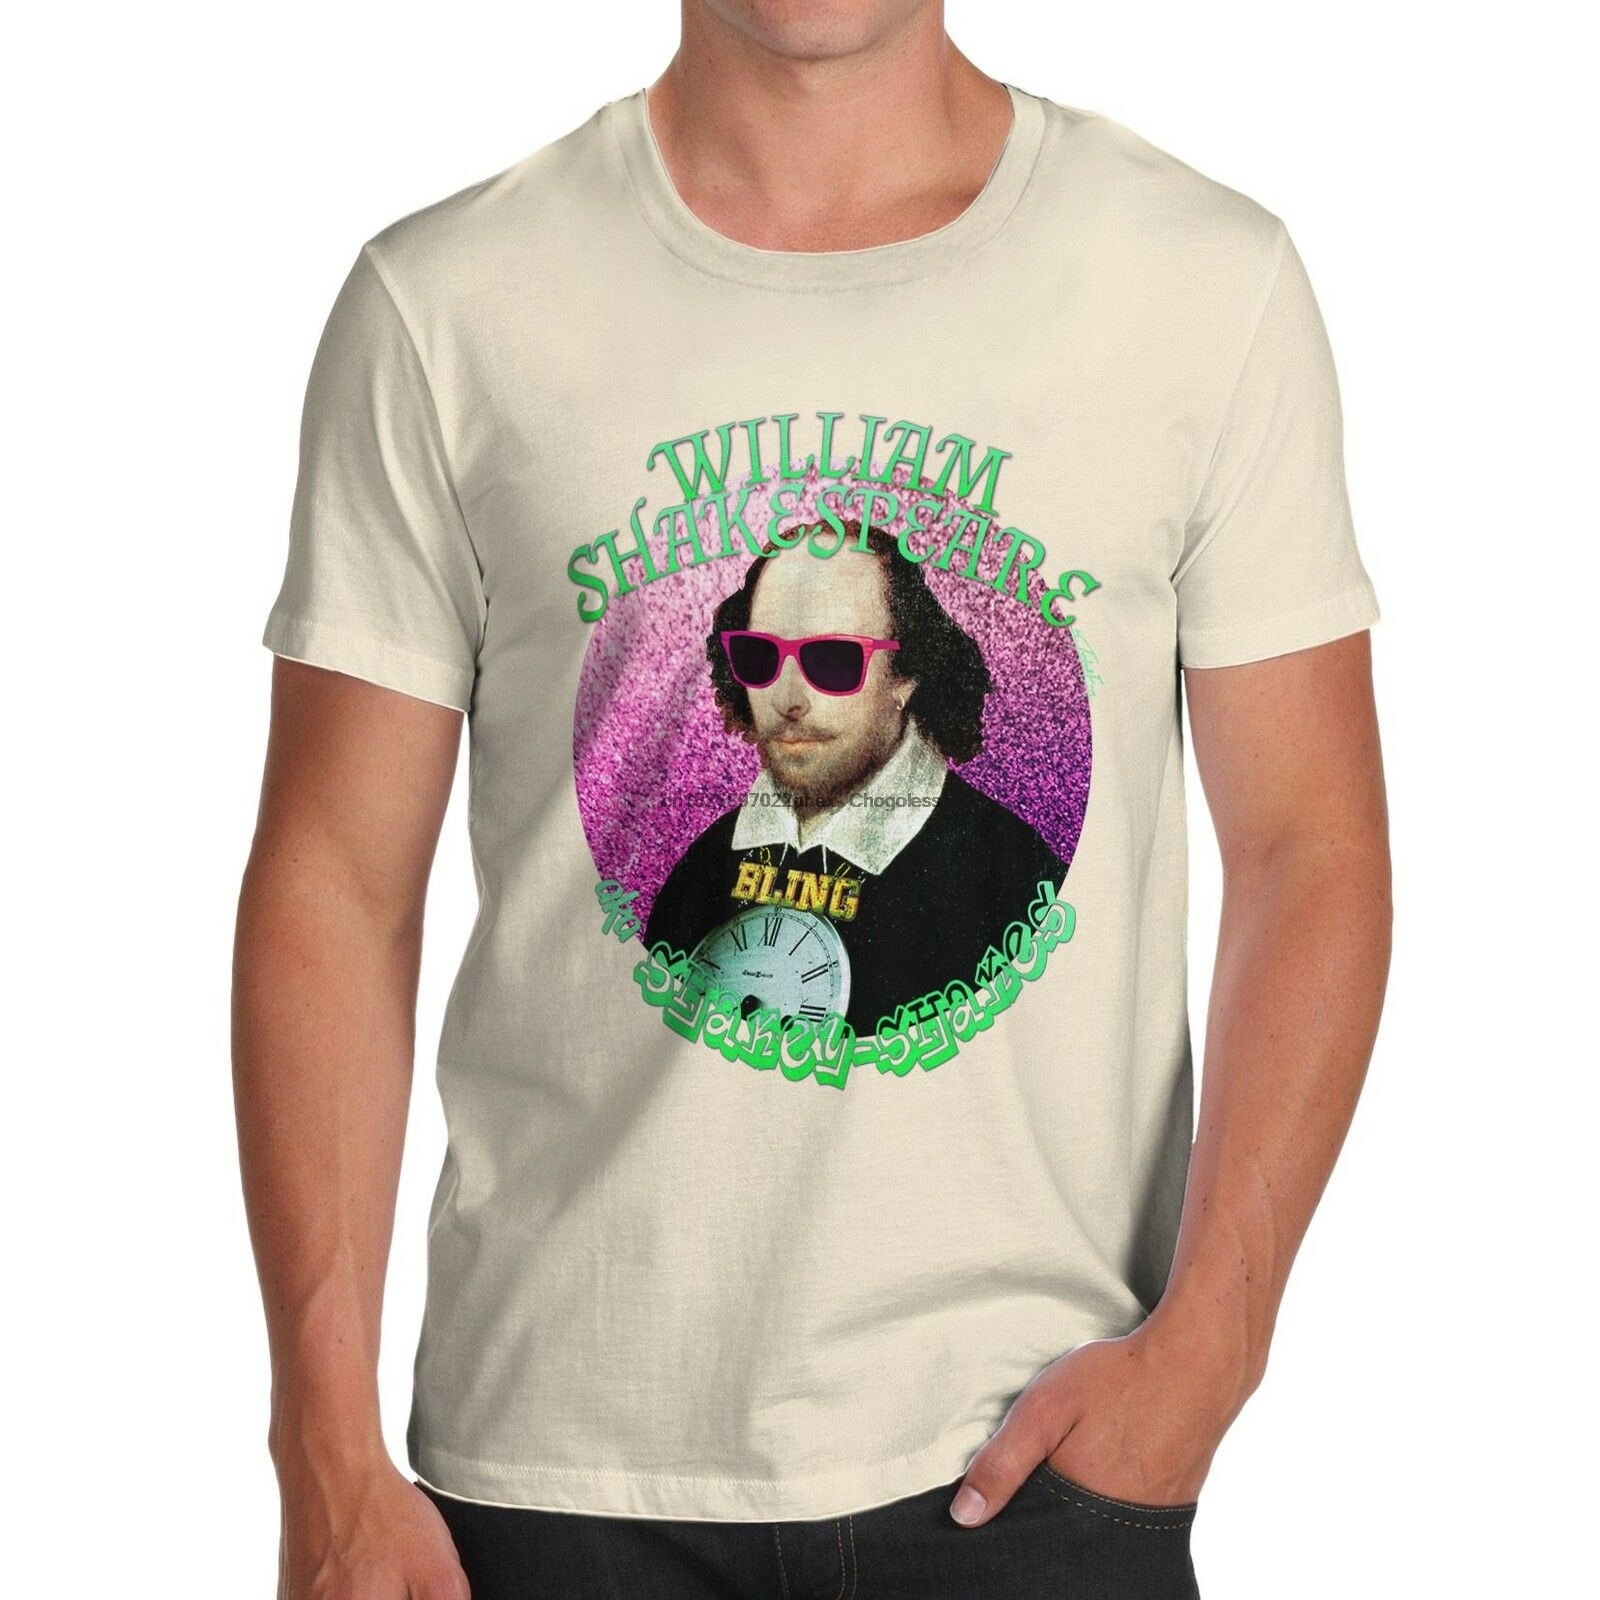 Männer der William Shakespeare Aka Shakey-Shakes Lustige T-Shirt